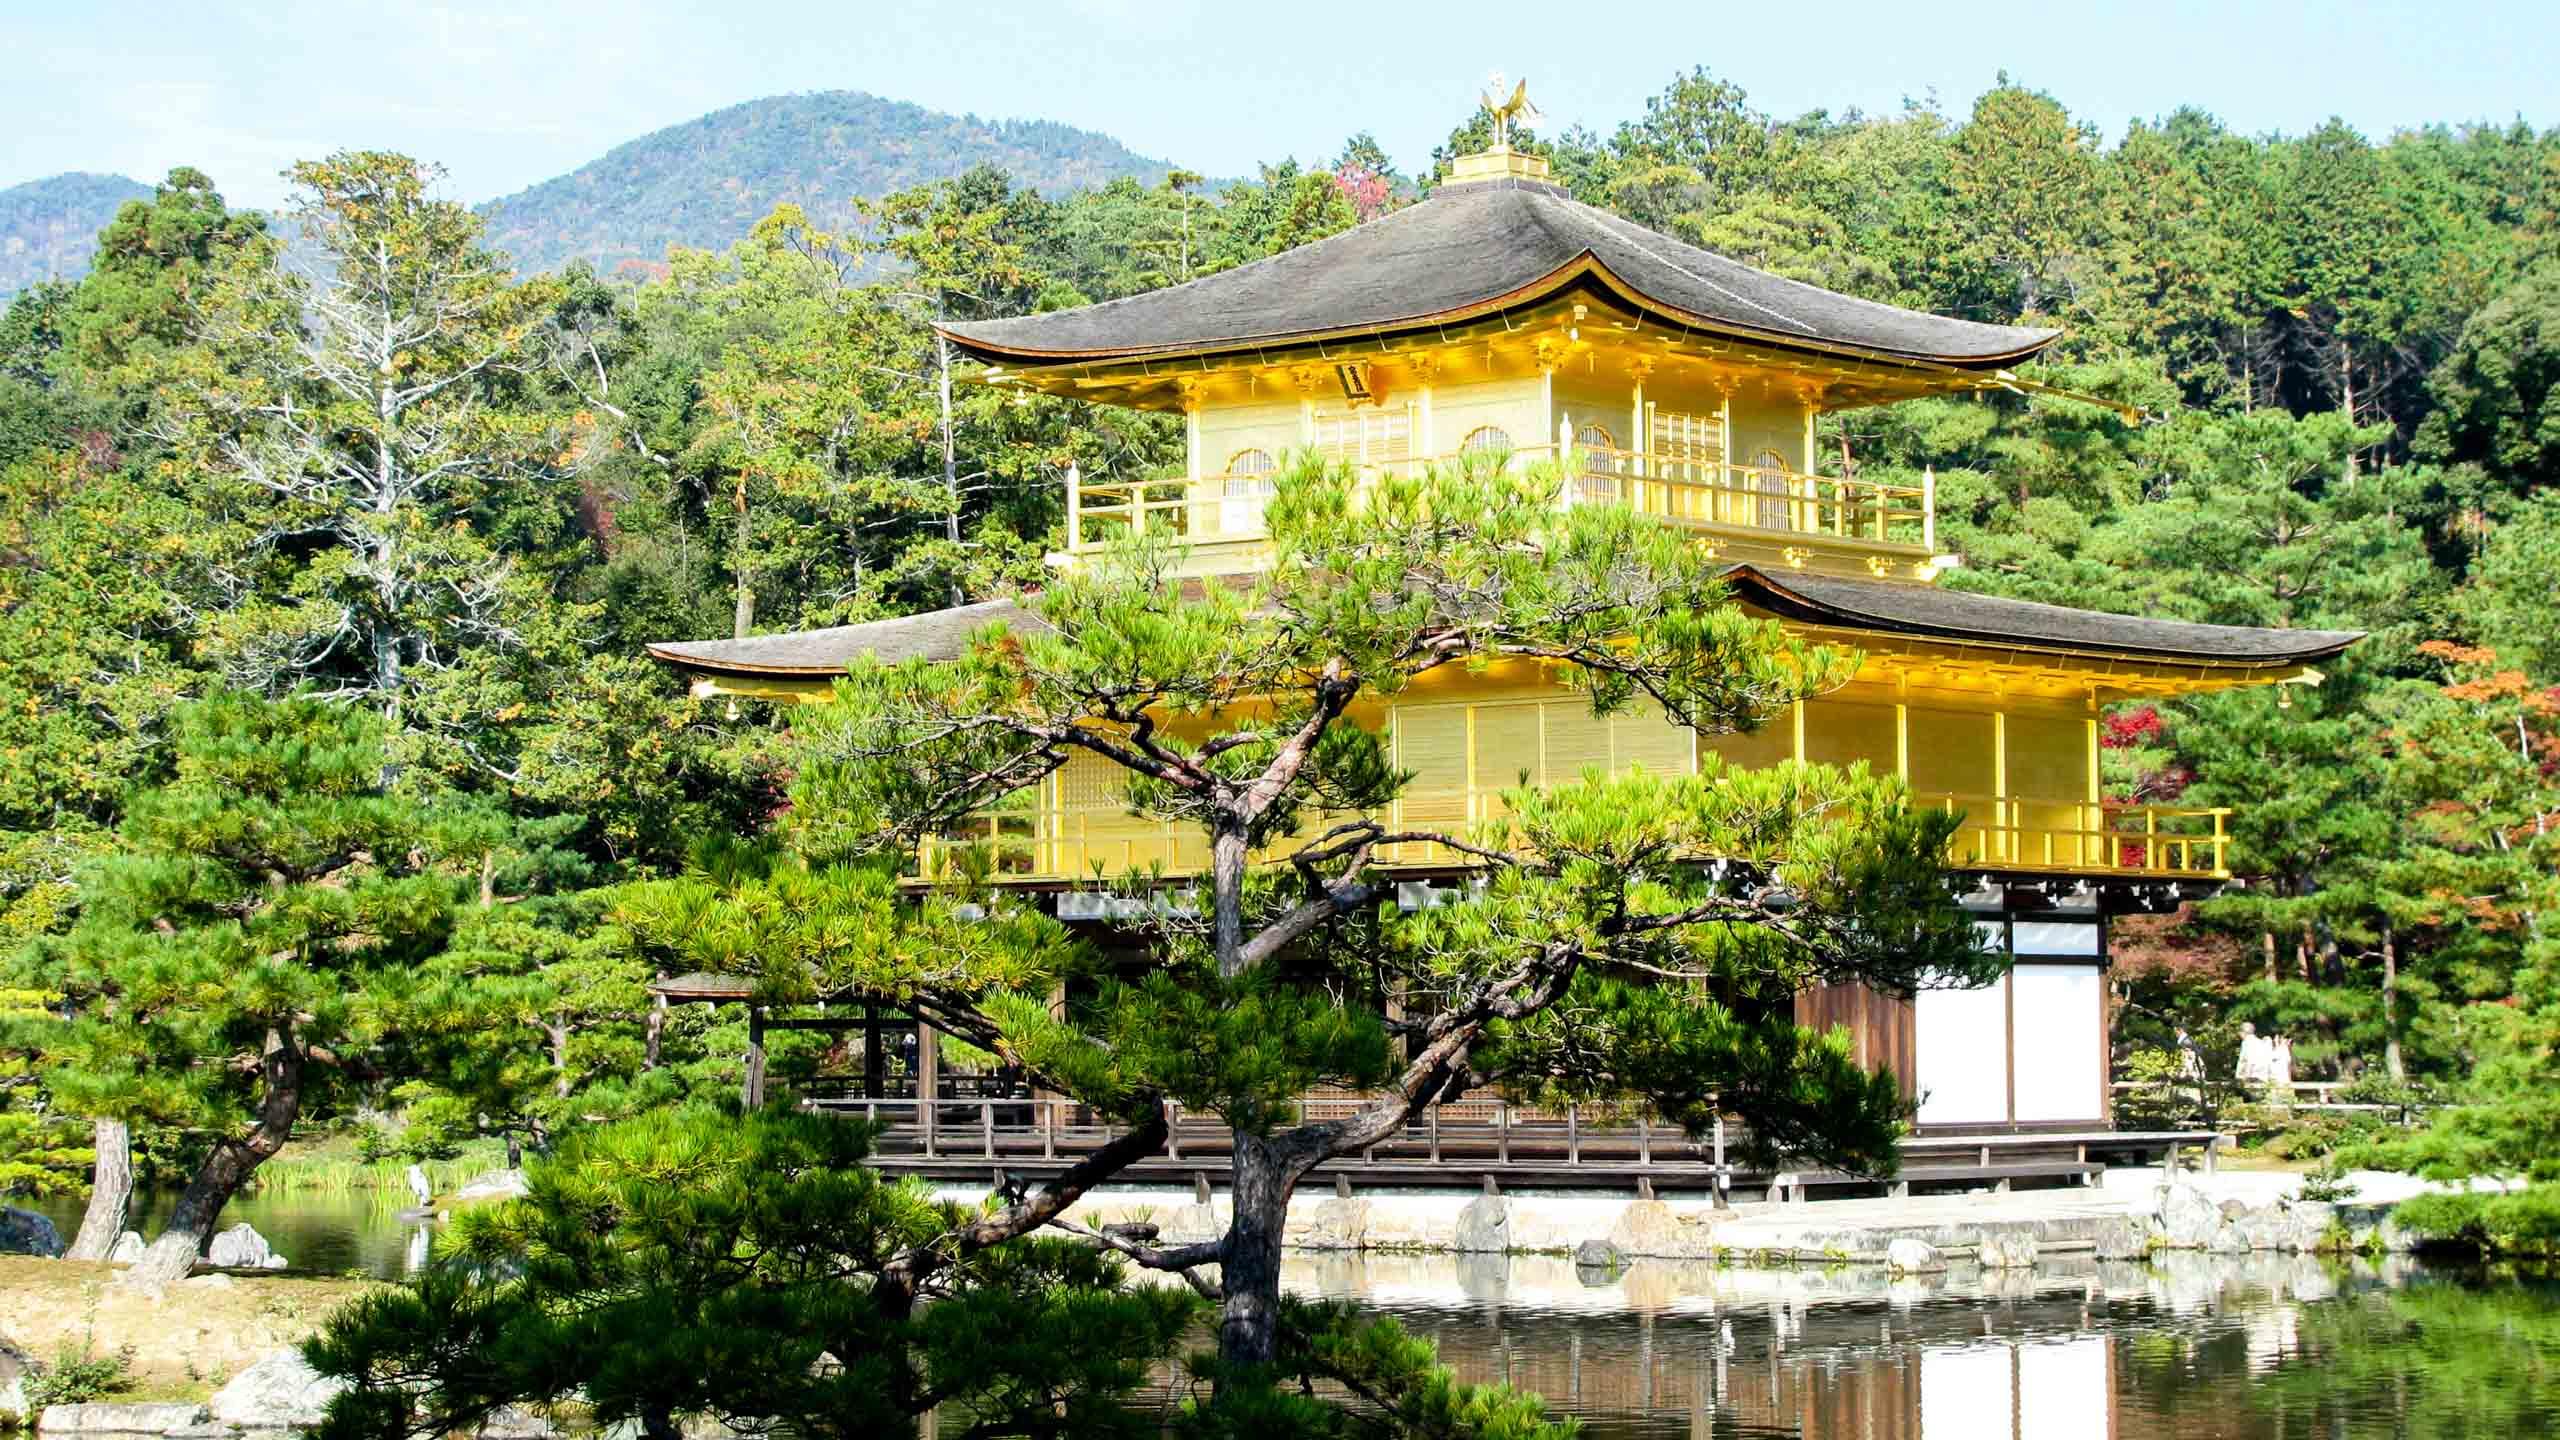 Japanese temple seen through trees